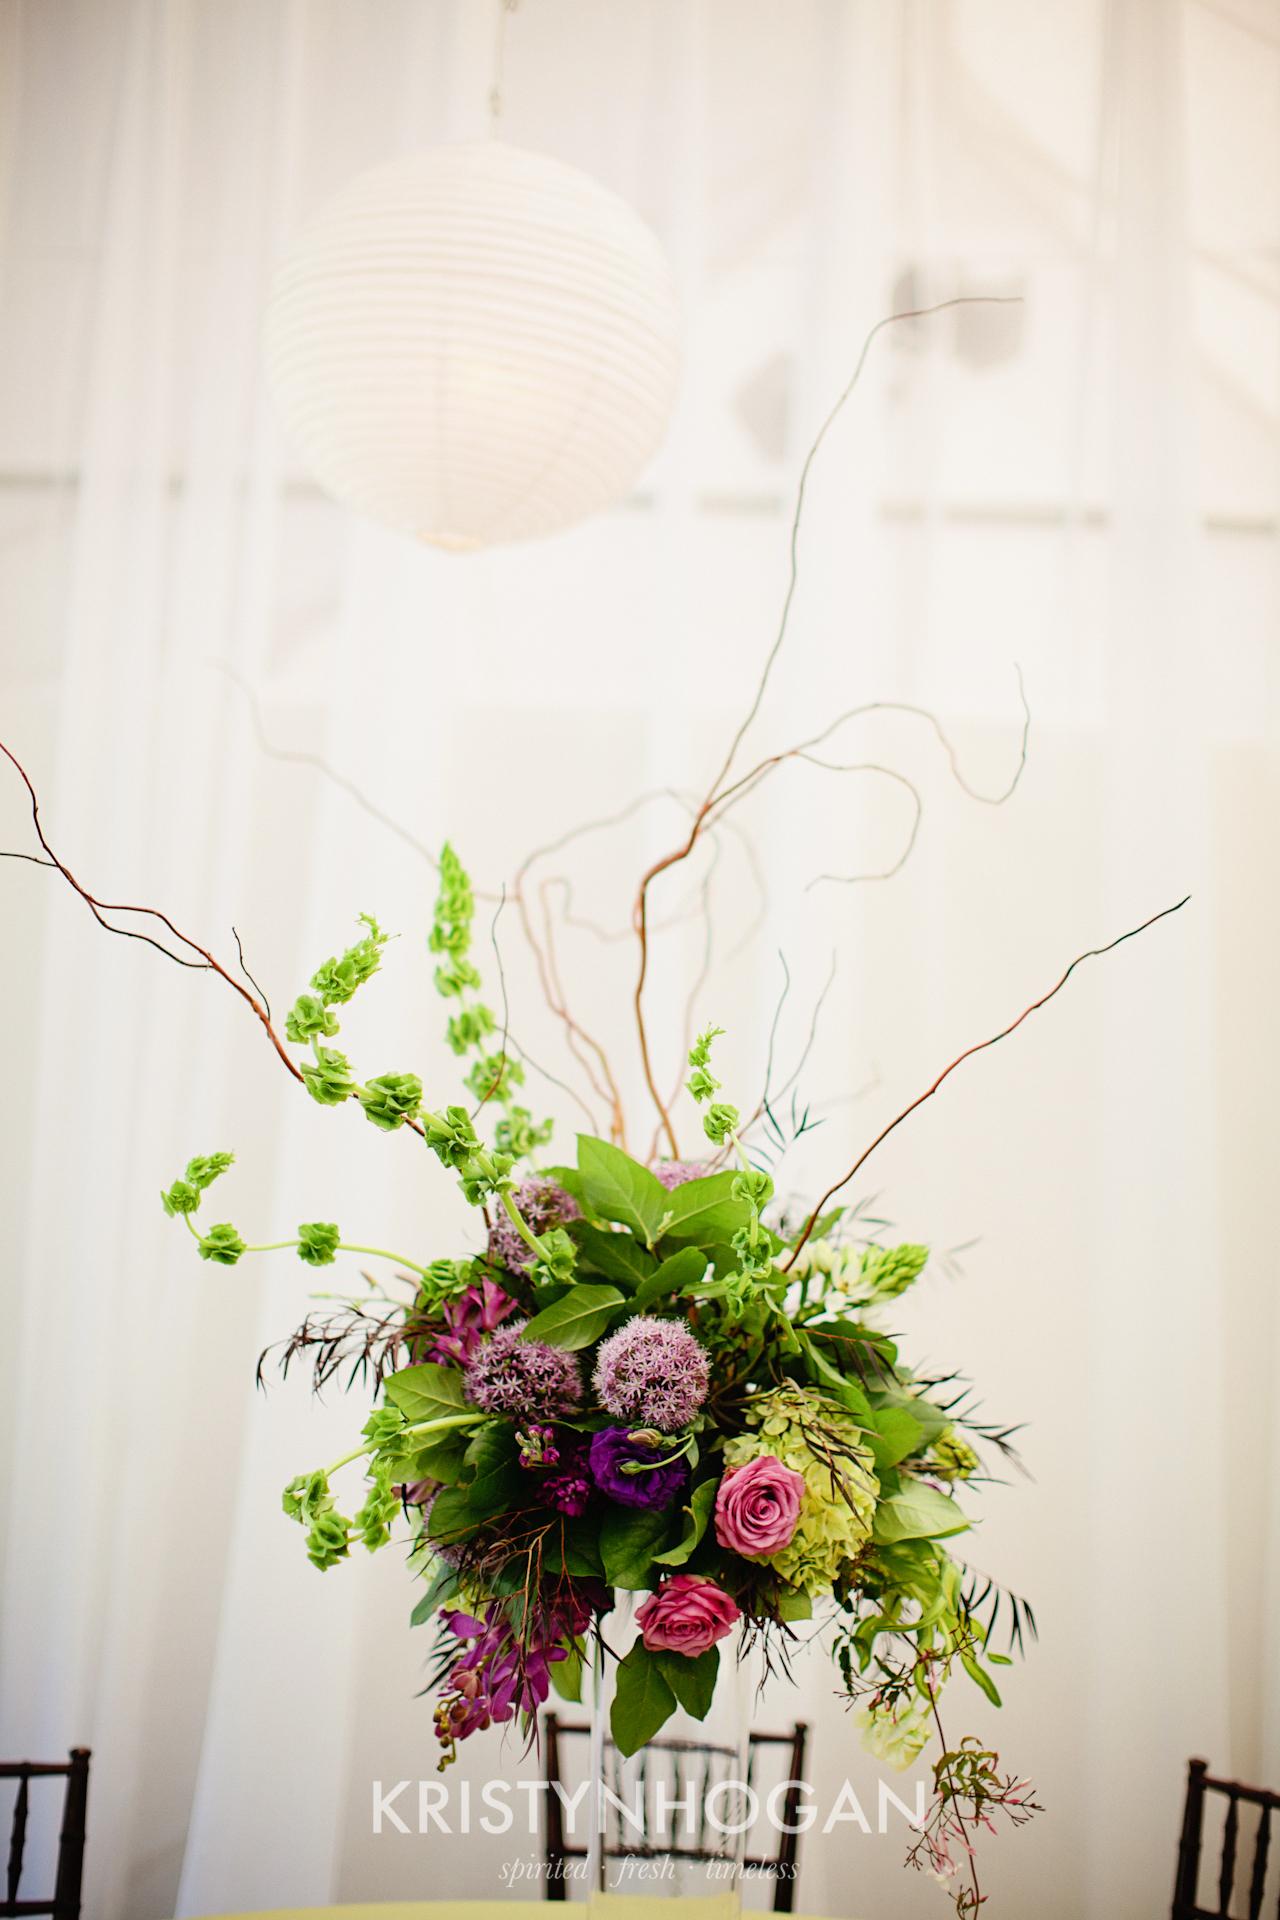 Nashville_Wedding_Photographer_Kristyn_Hogan_Samples_433.jpg